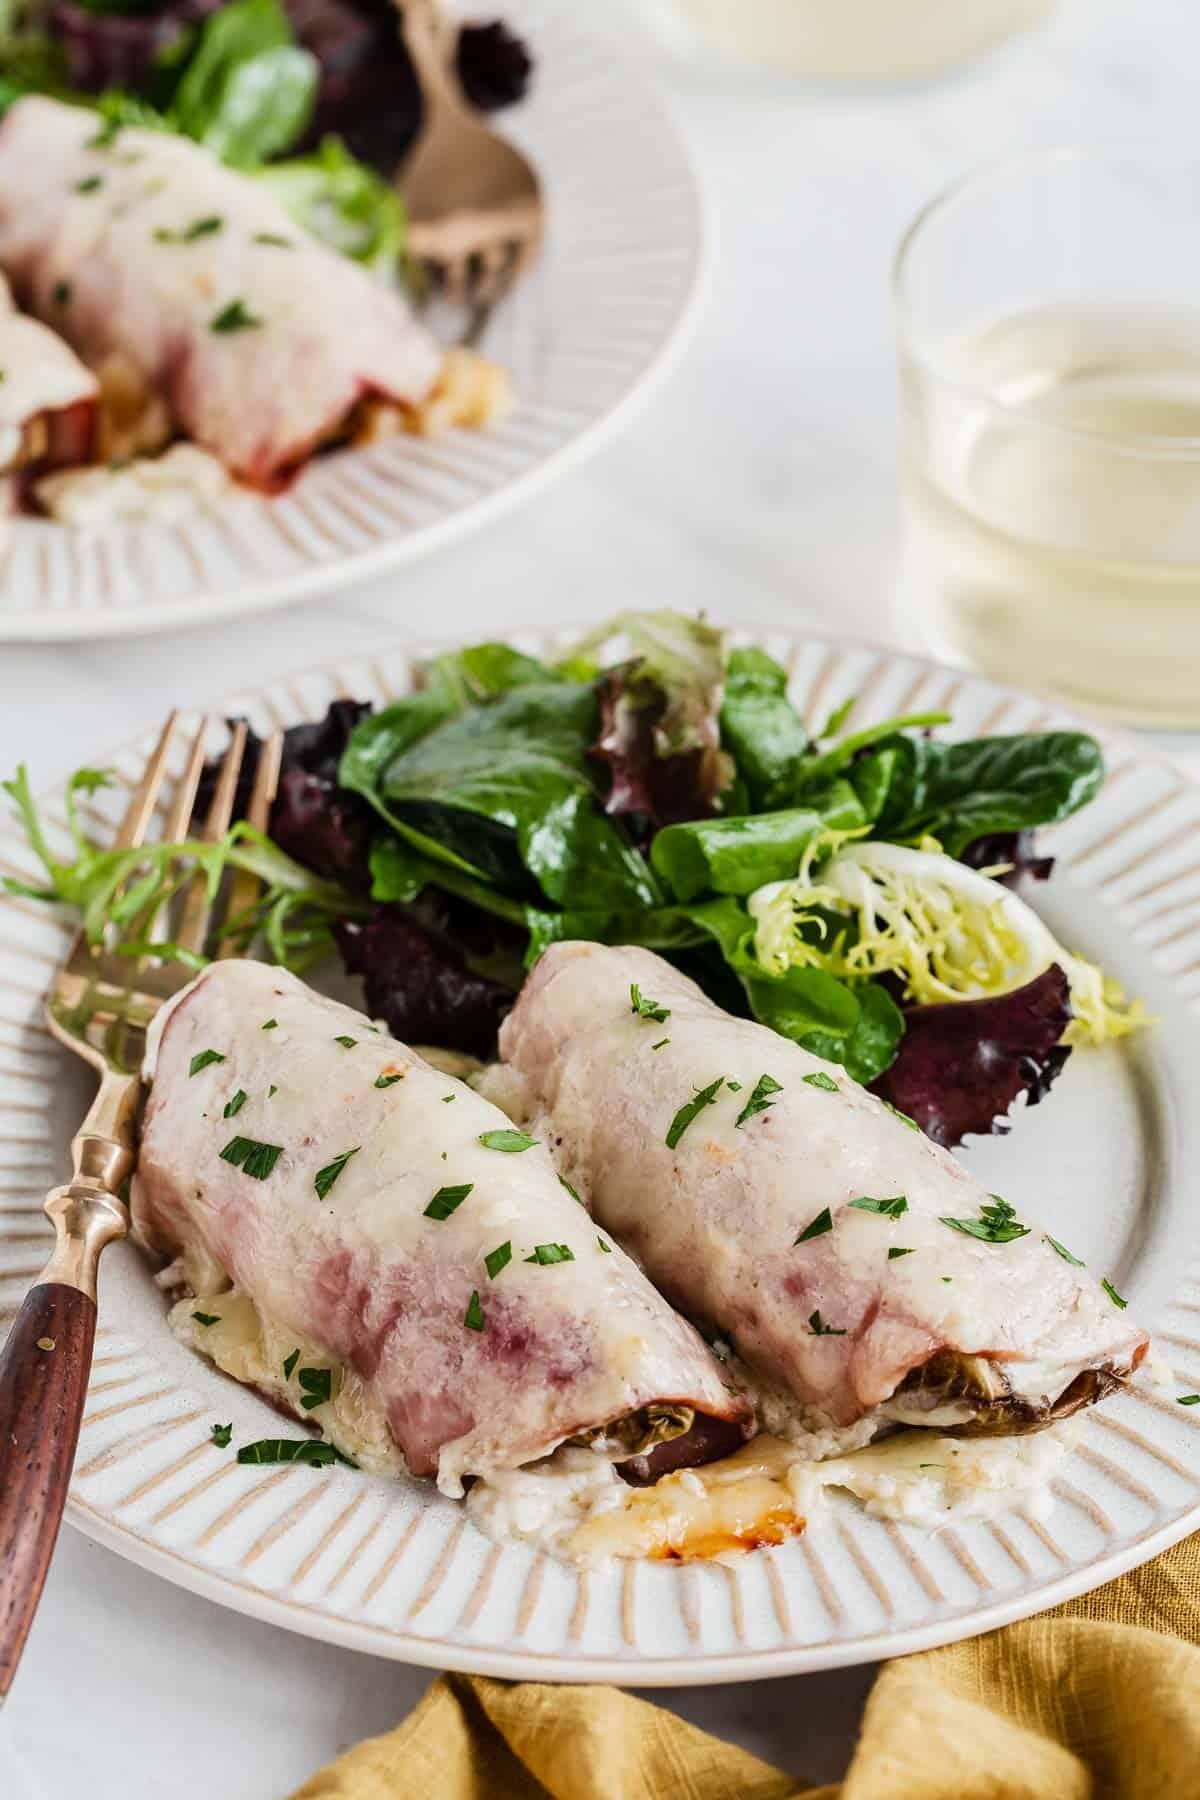 Plate of endives au gratin with side salad and fork.